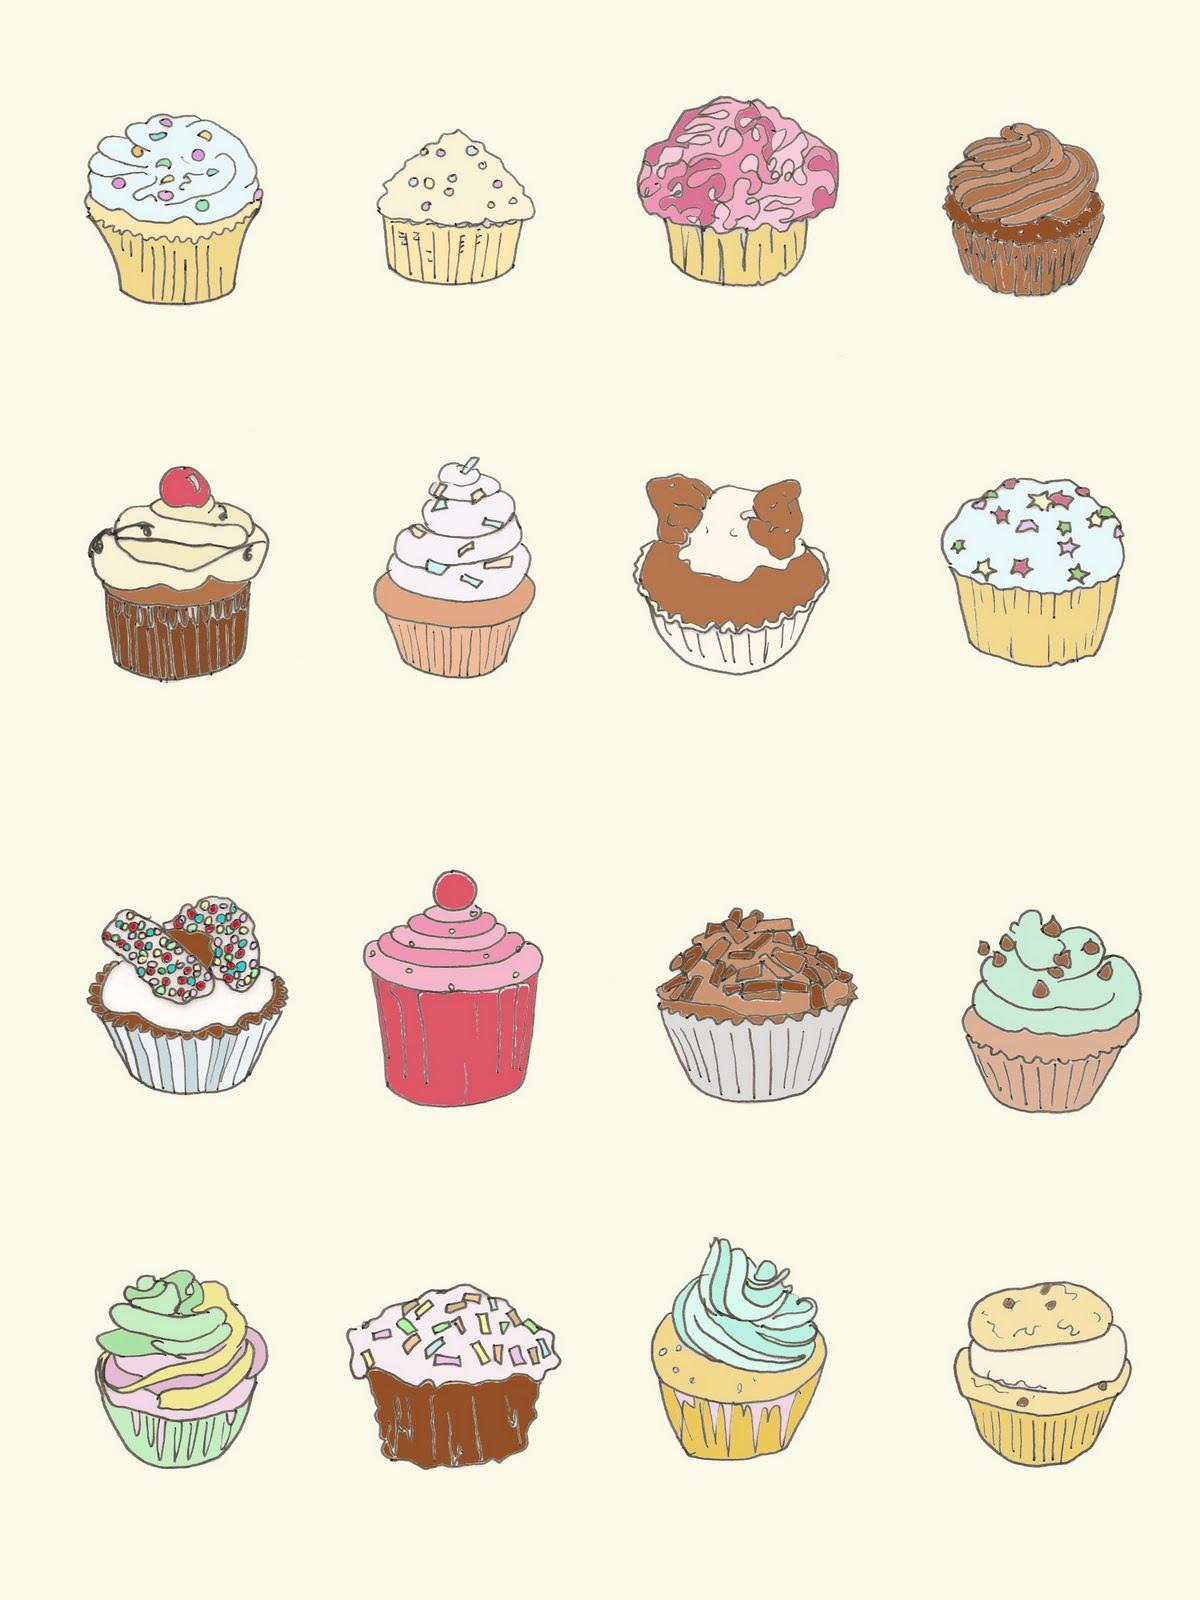 Cupcake Drawing Images : Carole Japp: Cupcakes